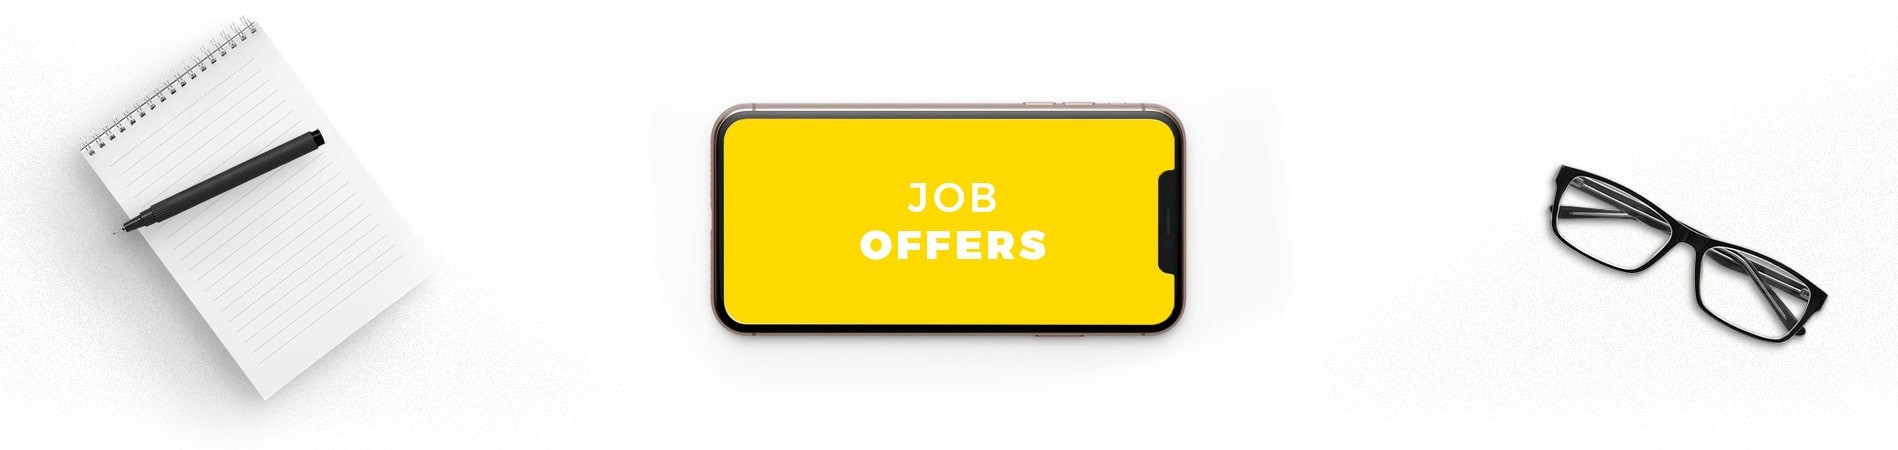 Wedia - Job offers